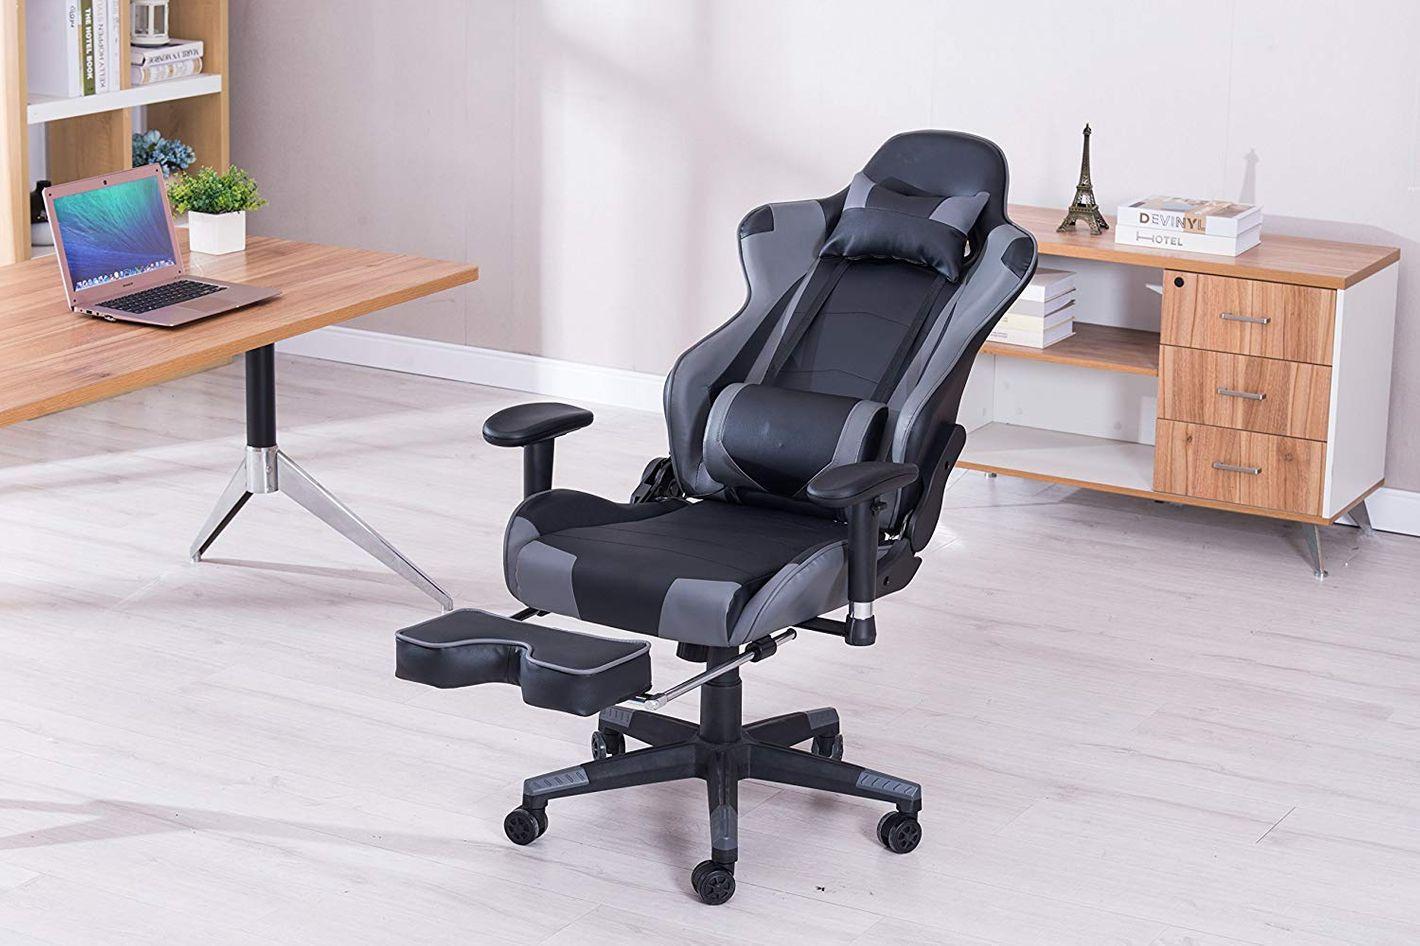 KILLABEE Big and Tall Massage Memory Foam Gaming Chair